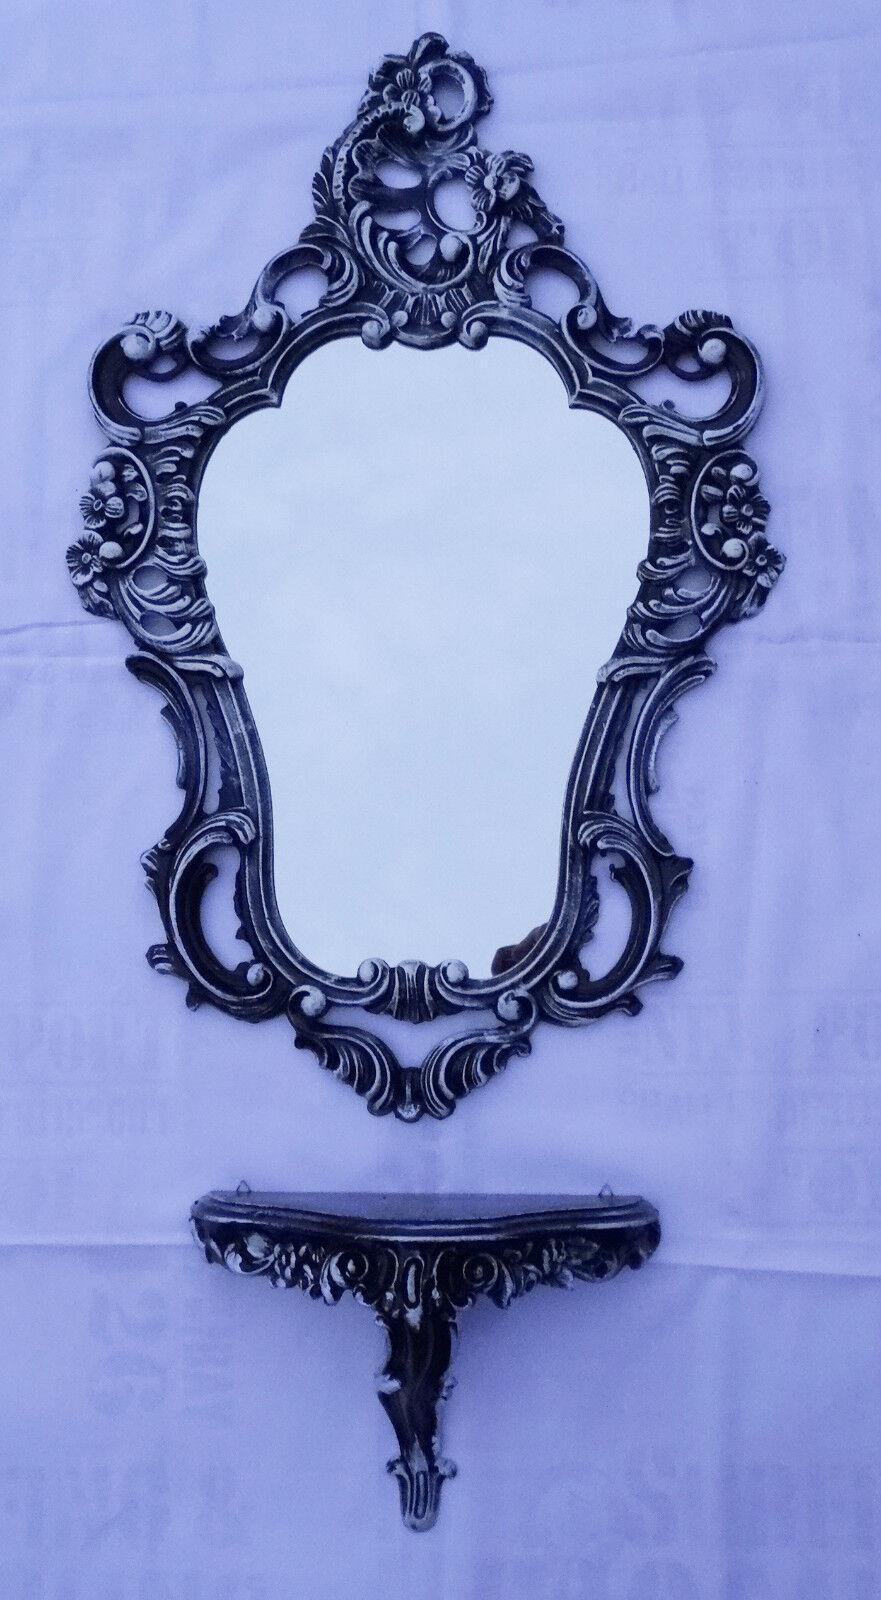 Set con Negro blancoo Espejo de parojo + eMPLAZAMIENTO CONSOLA 50x76 antigua